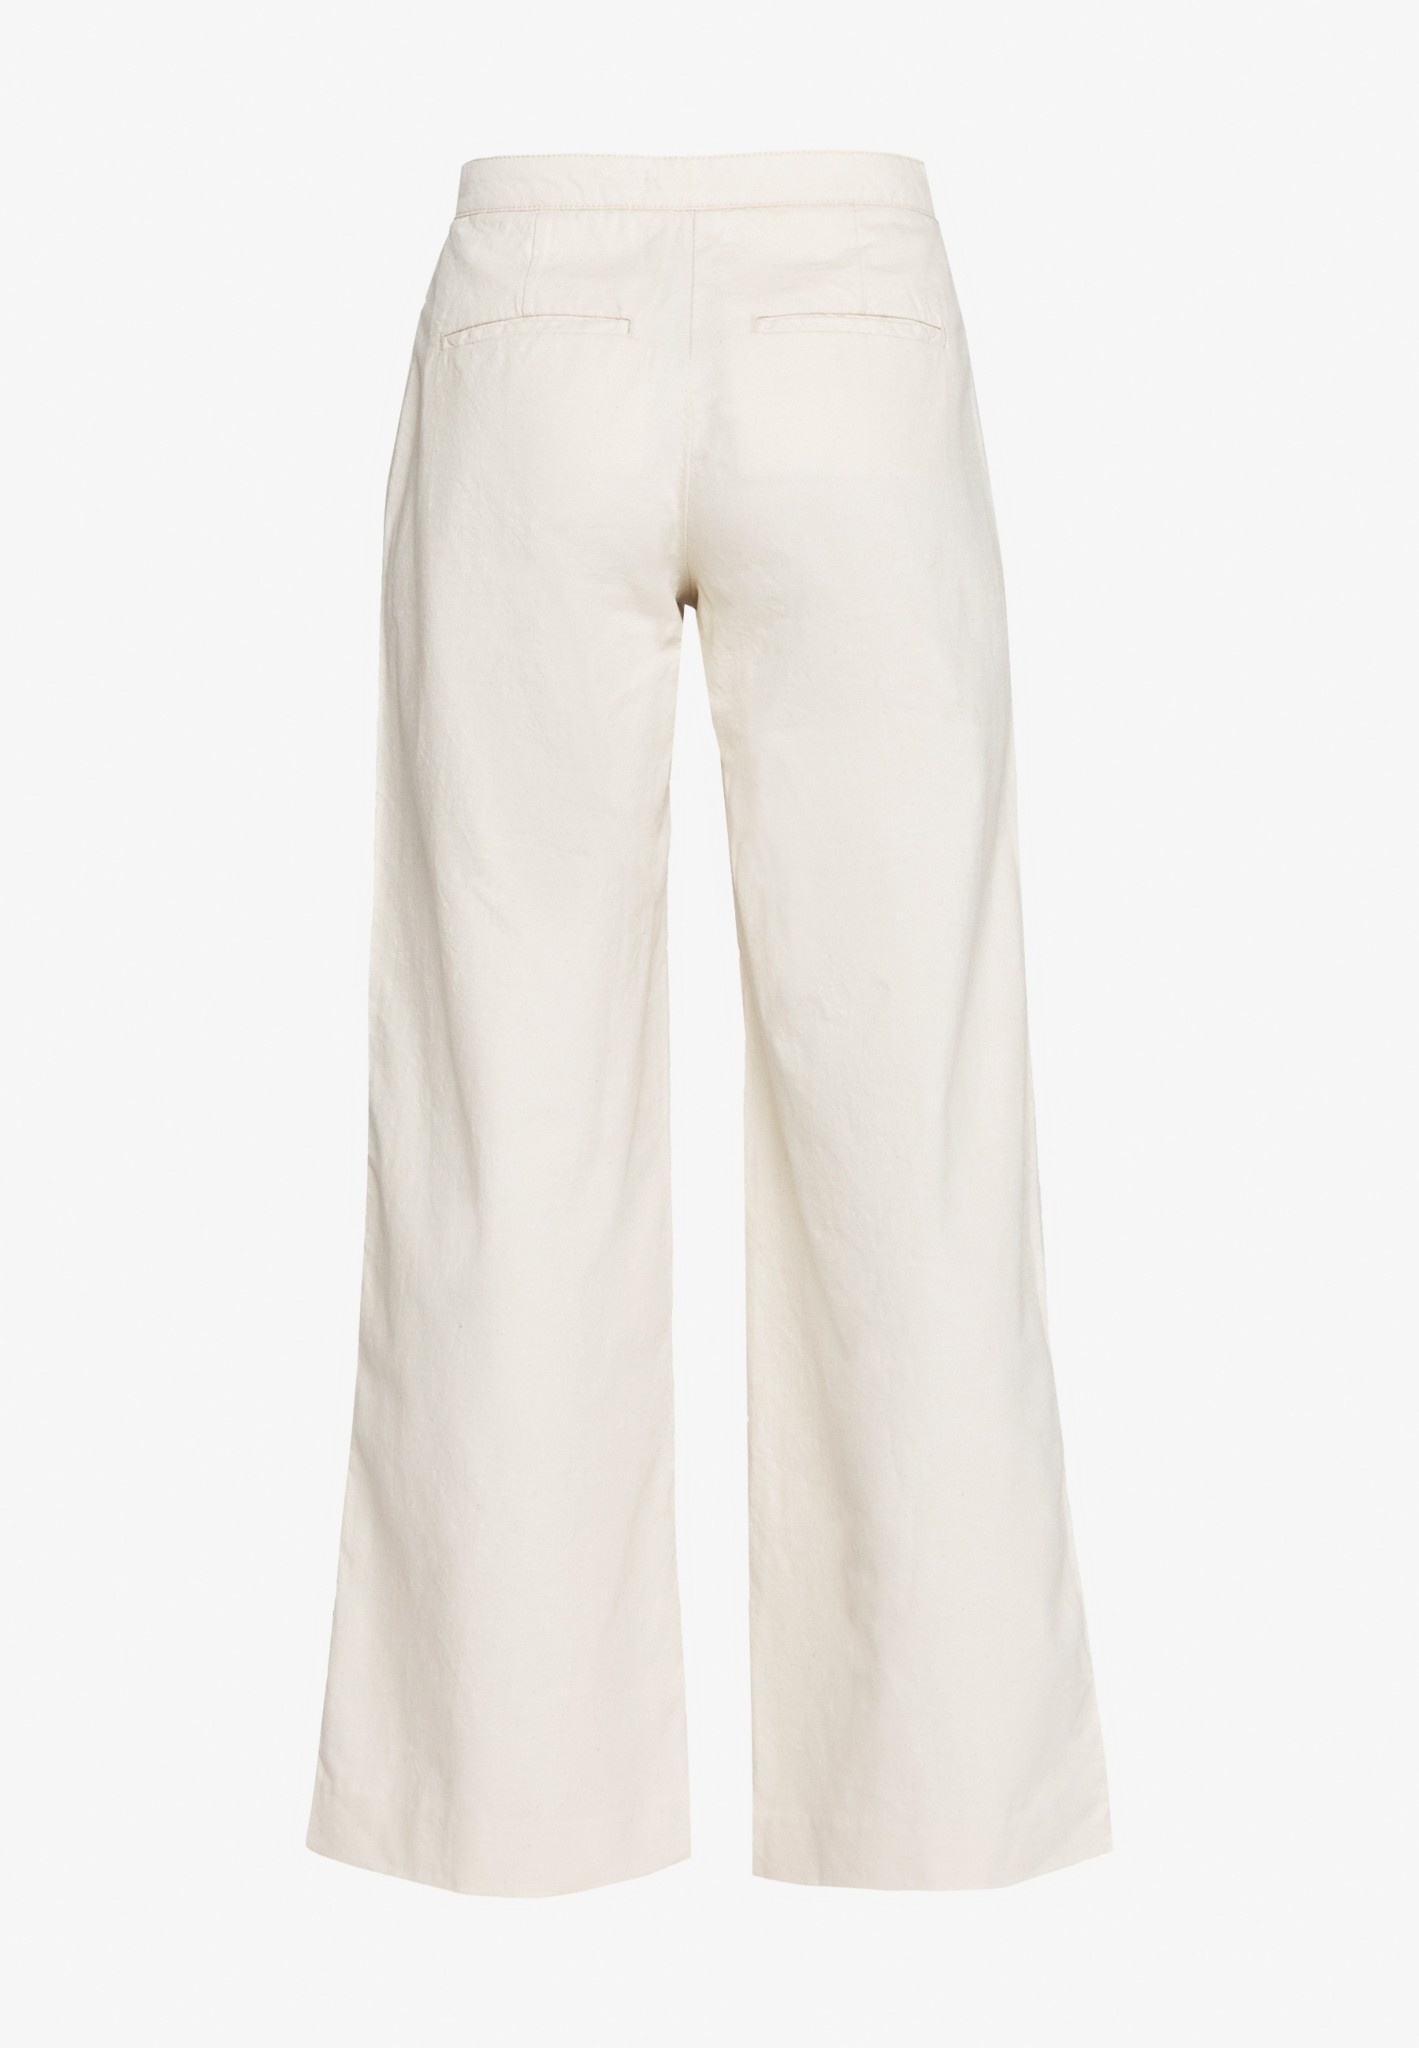 Collot trousers Samsoe Samsoe-2